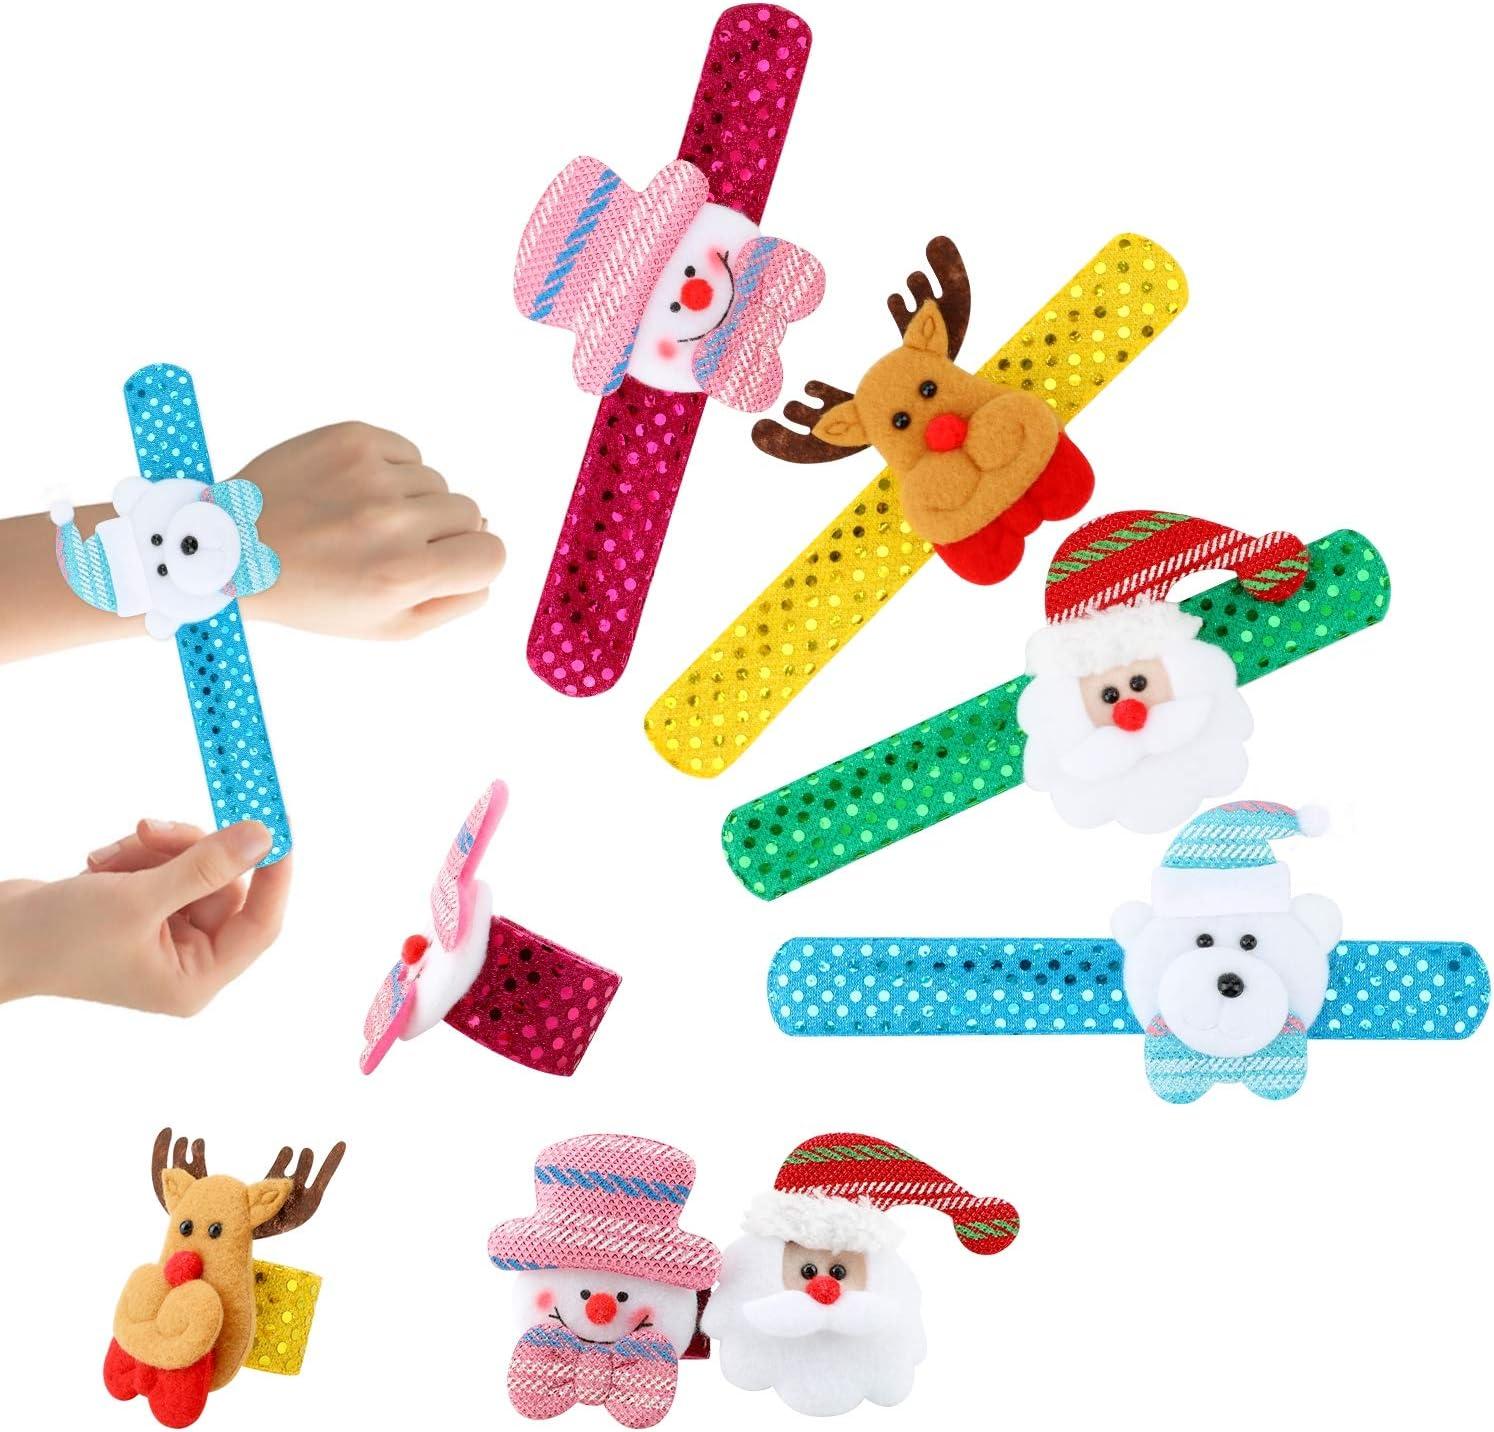 Hifot Christmas Slap Bracelets Party Favour Xmas Slap Band for Kids Party Bags Filler with Snowman Deer Bear Santa 4pcs Christmas Bead Maze Puzzle 6pcs for Girls /& Boys Christmas Stocking Fillers